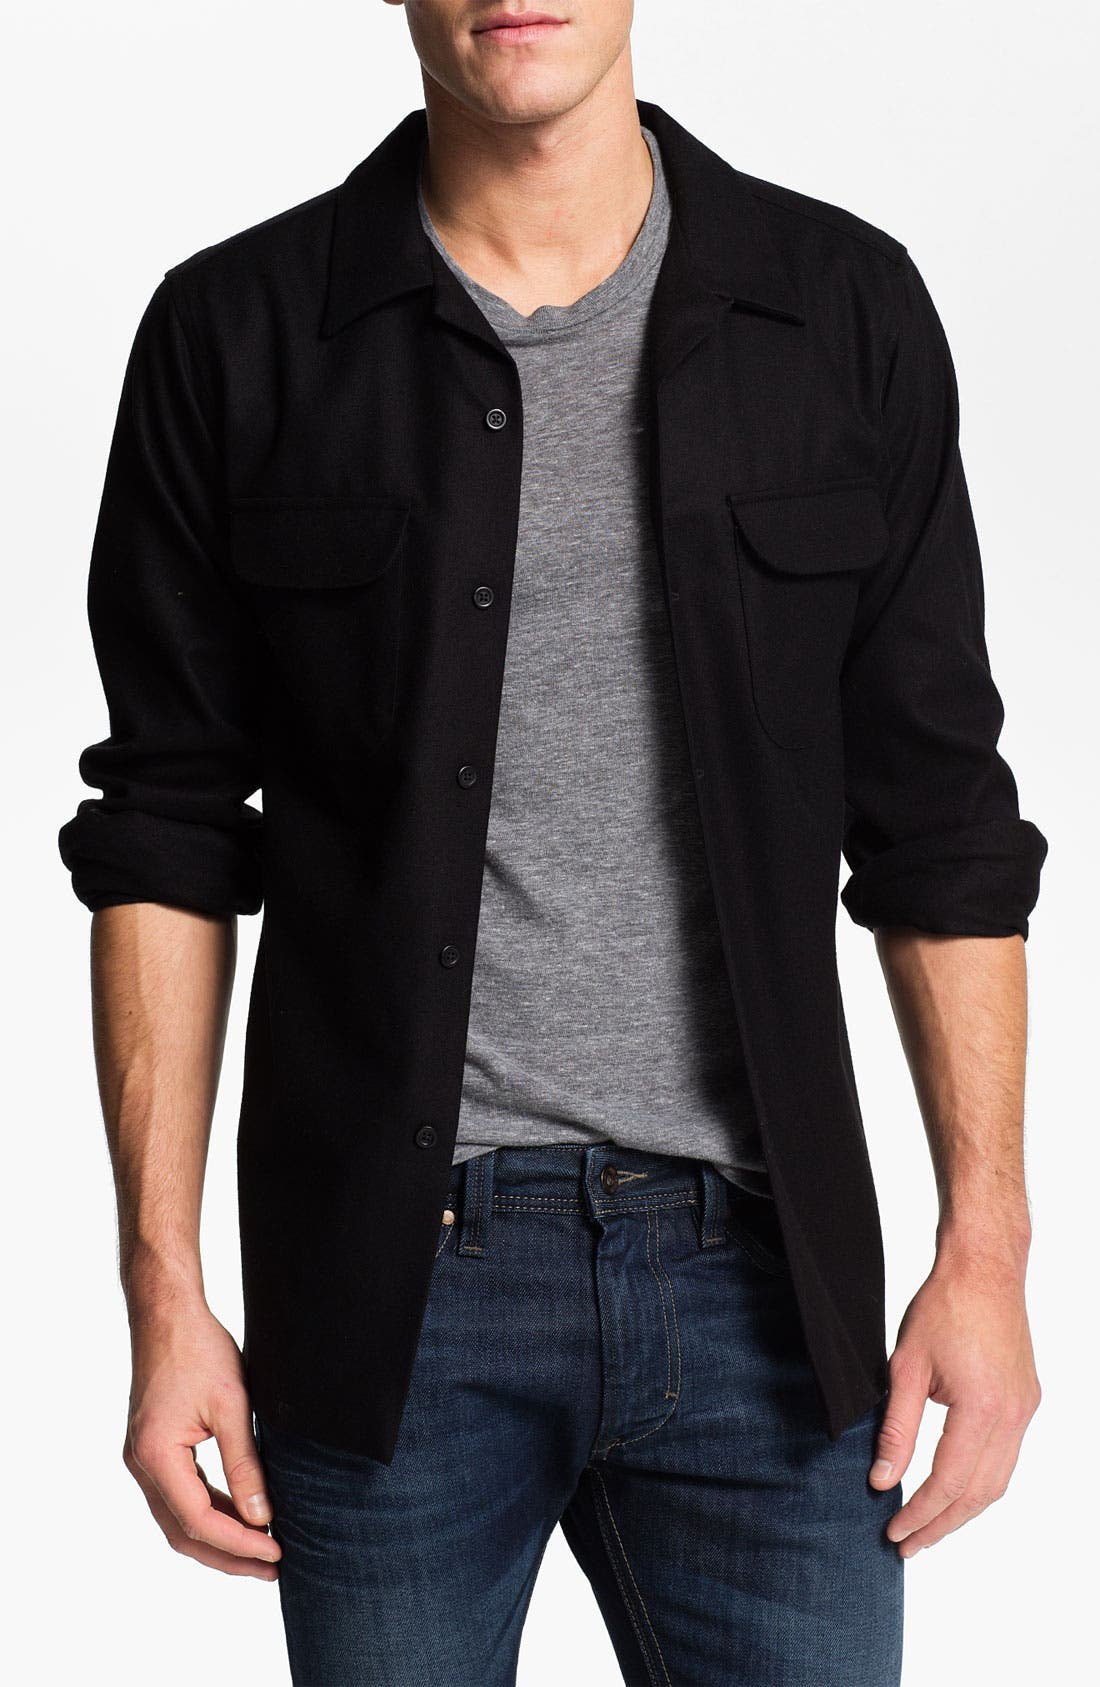 Alternate Image 1 Selected - Pendleton 'Board' Plaid Flannel Shirt